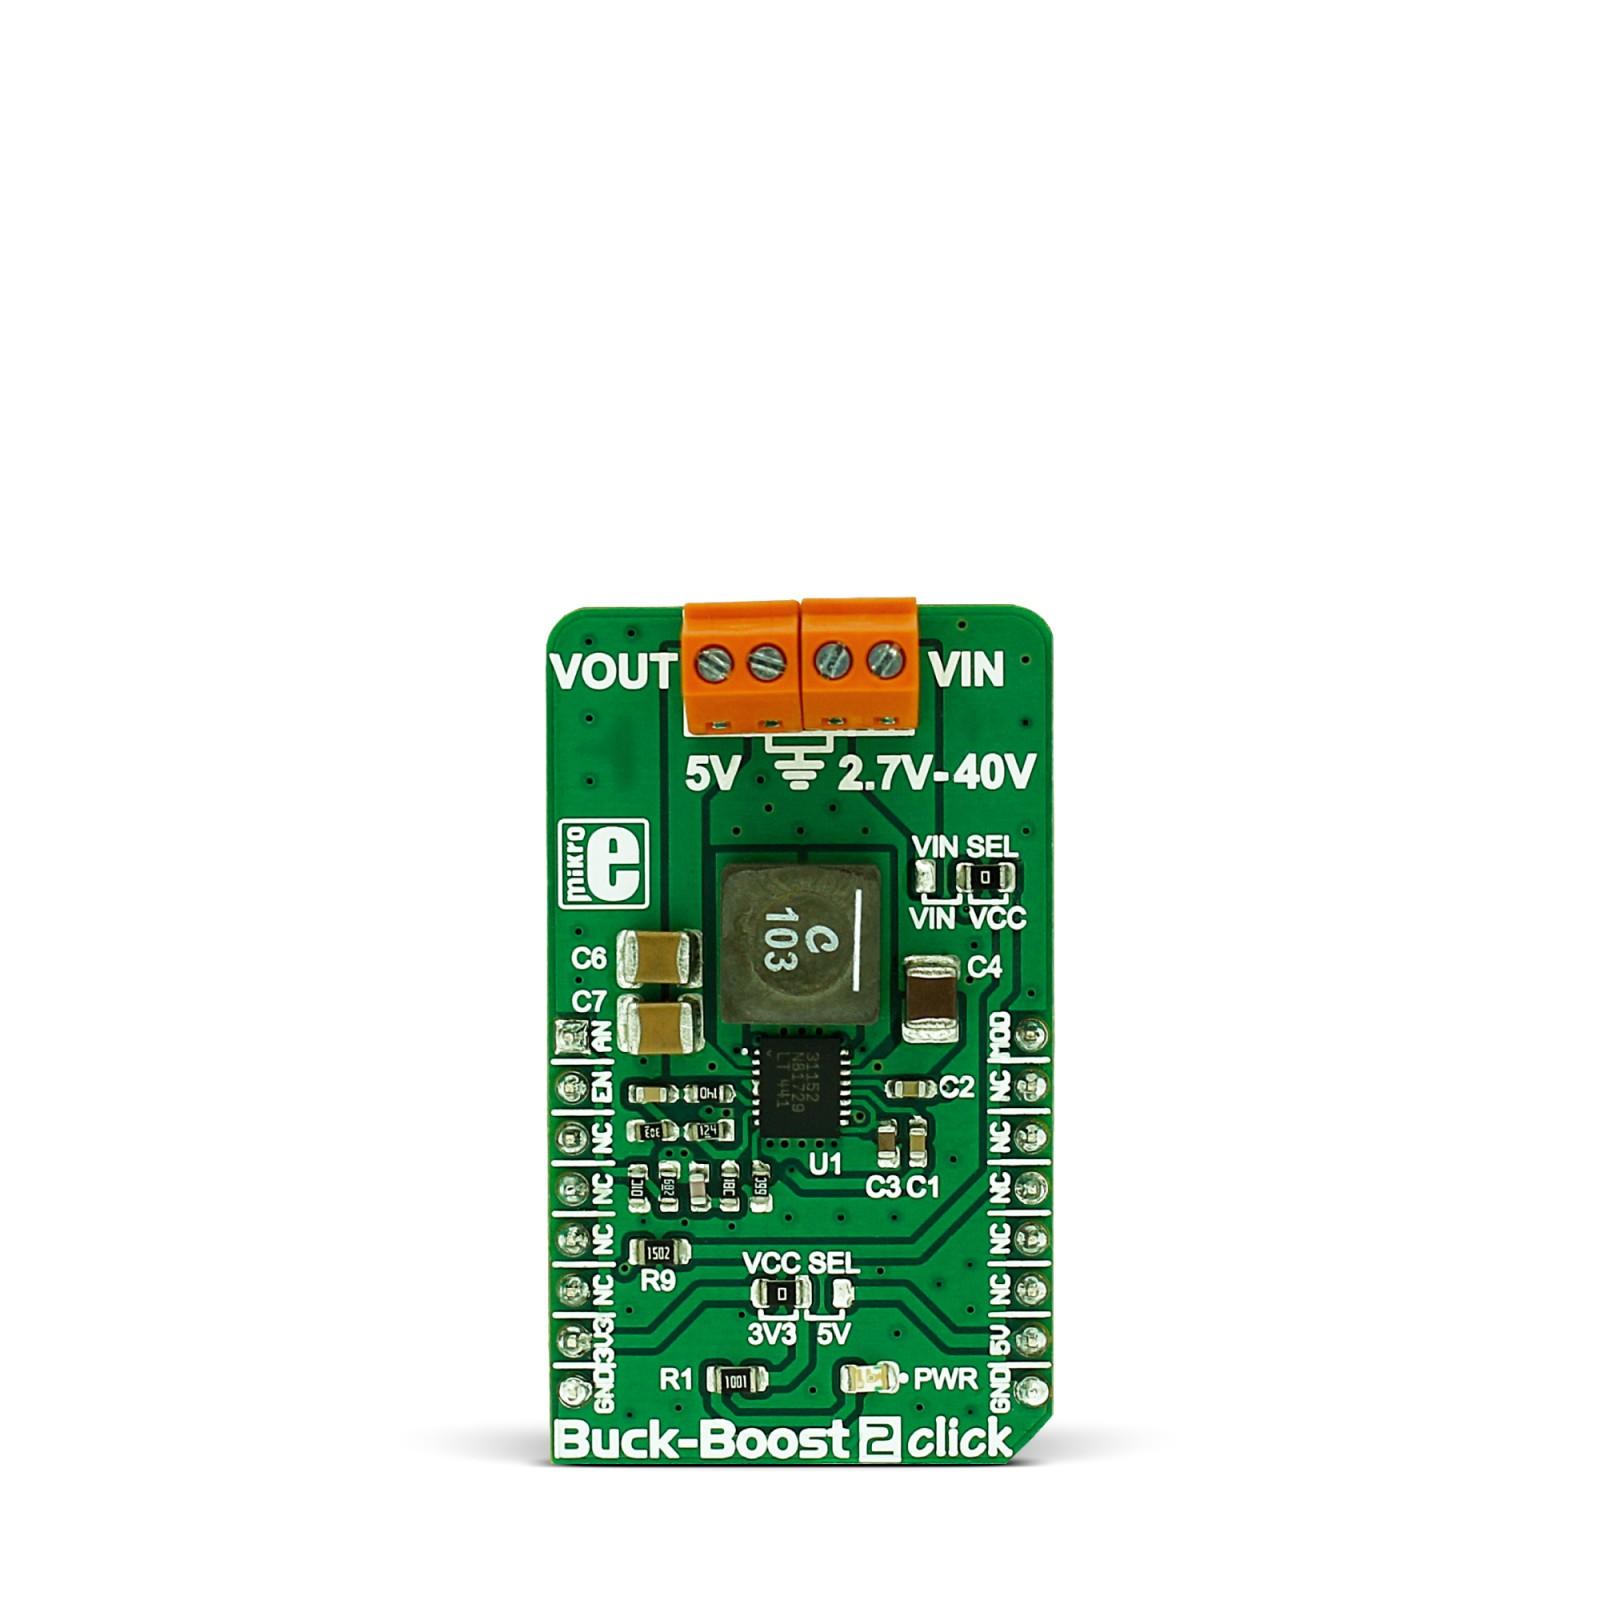 Buck Boost 2 Click Mikroelektronika Regulator Current Booster Mgctlbxnmzp Mgctlbxv5112 Mgctlbxlc Mgctlbxpprestashop